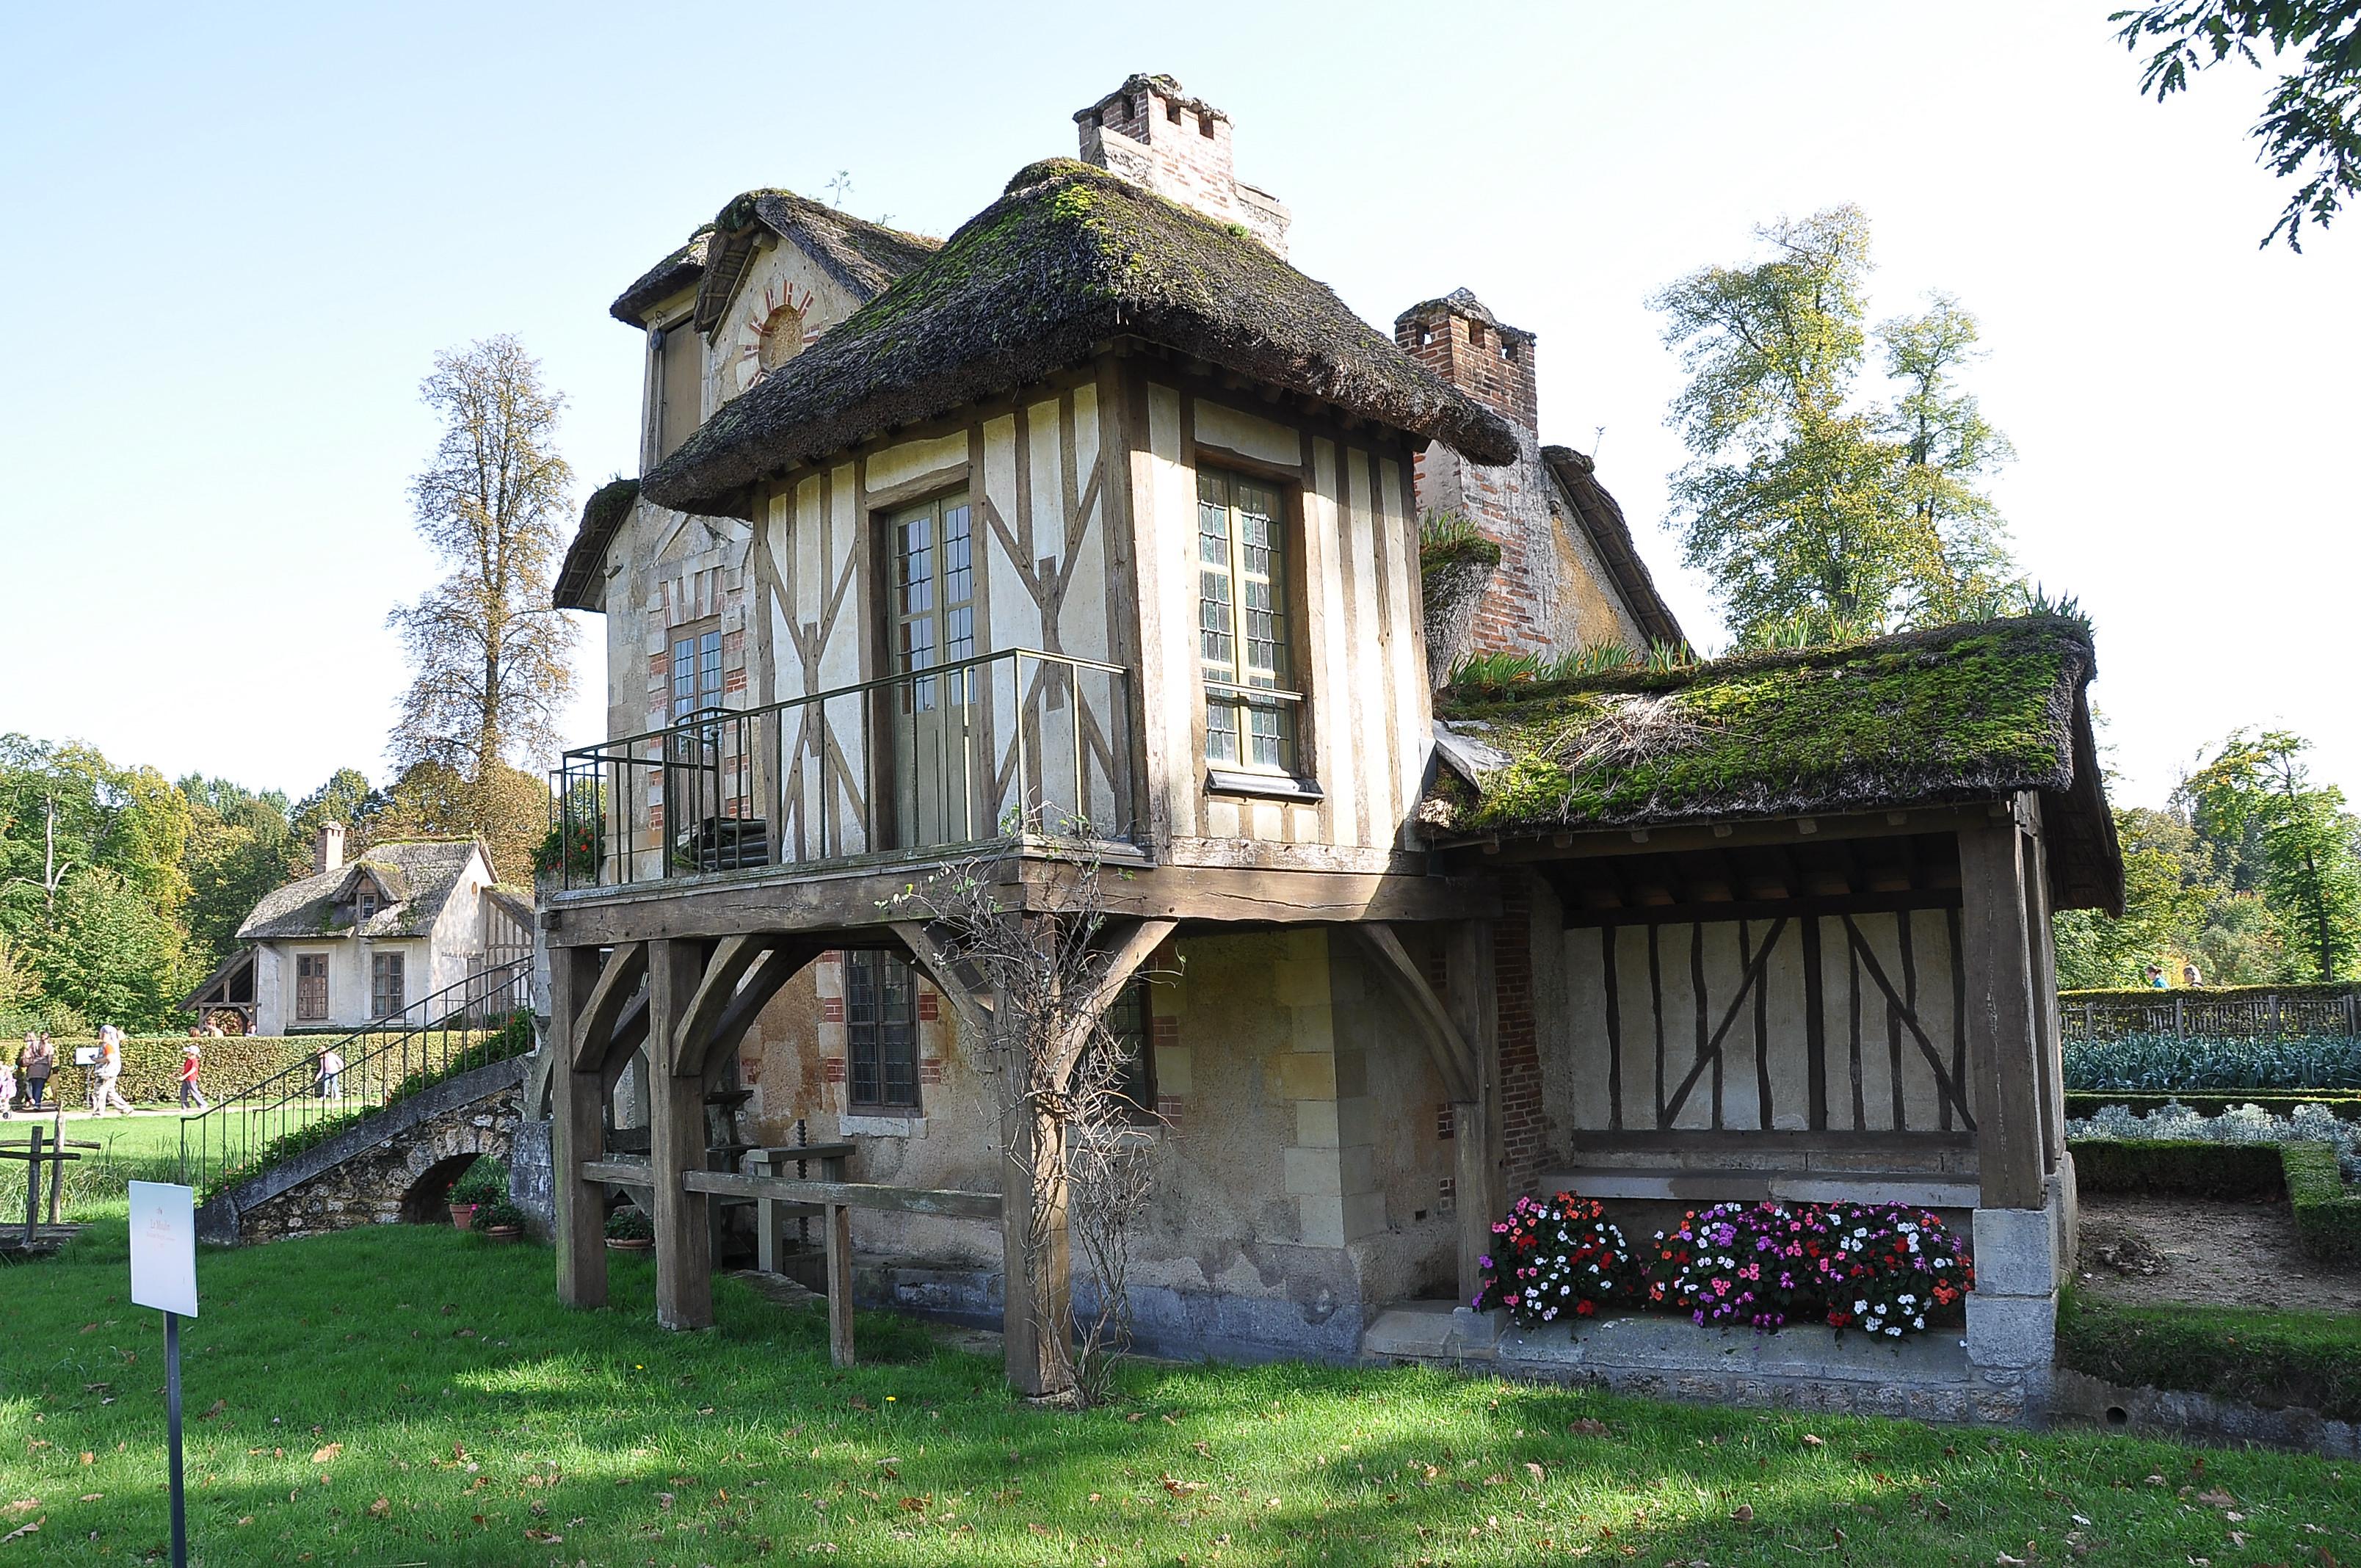 file moulin du hameau de la reine versailles 004 jpg wikimedia commons. Black Bedroom Furniture Sets. Home Design Ideas